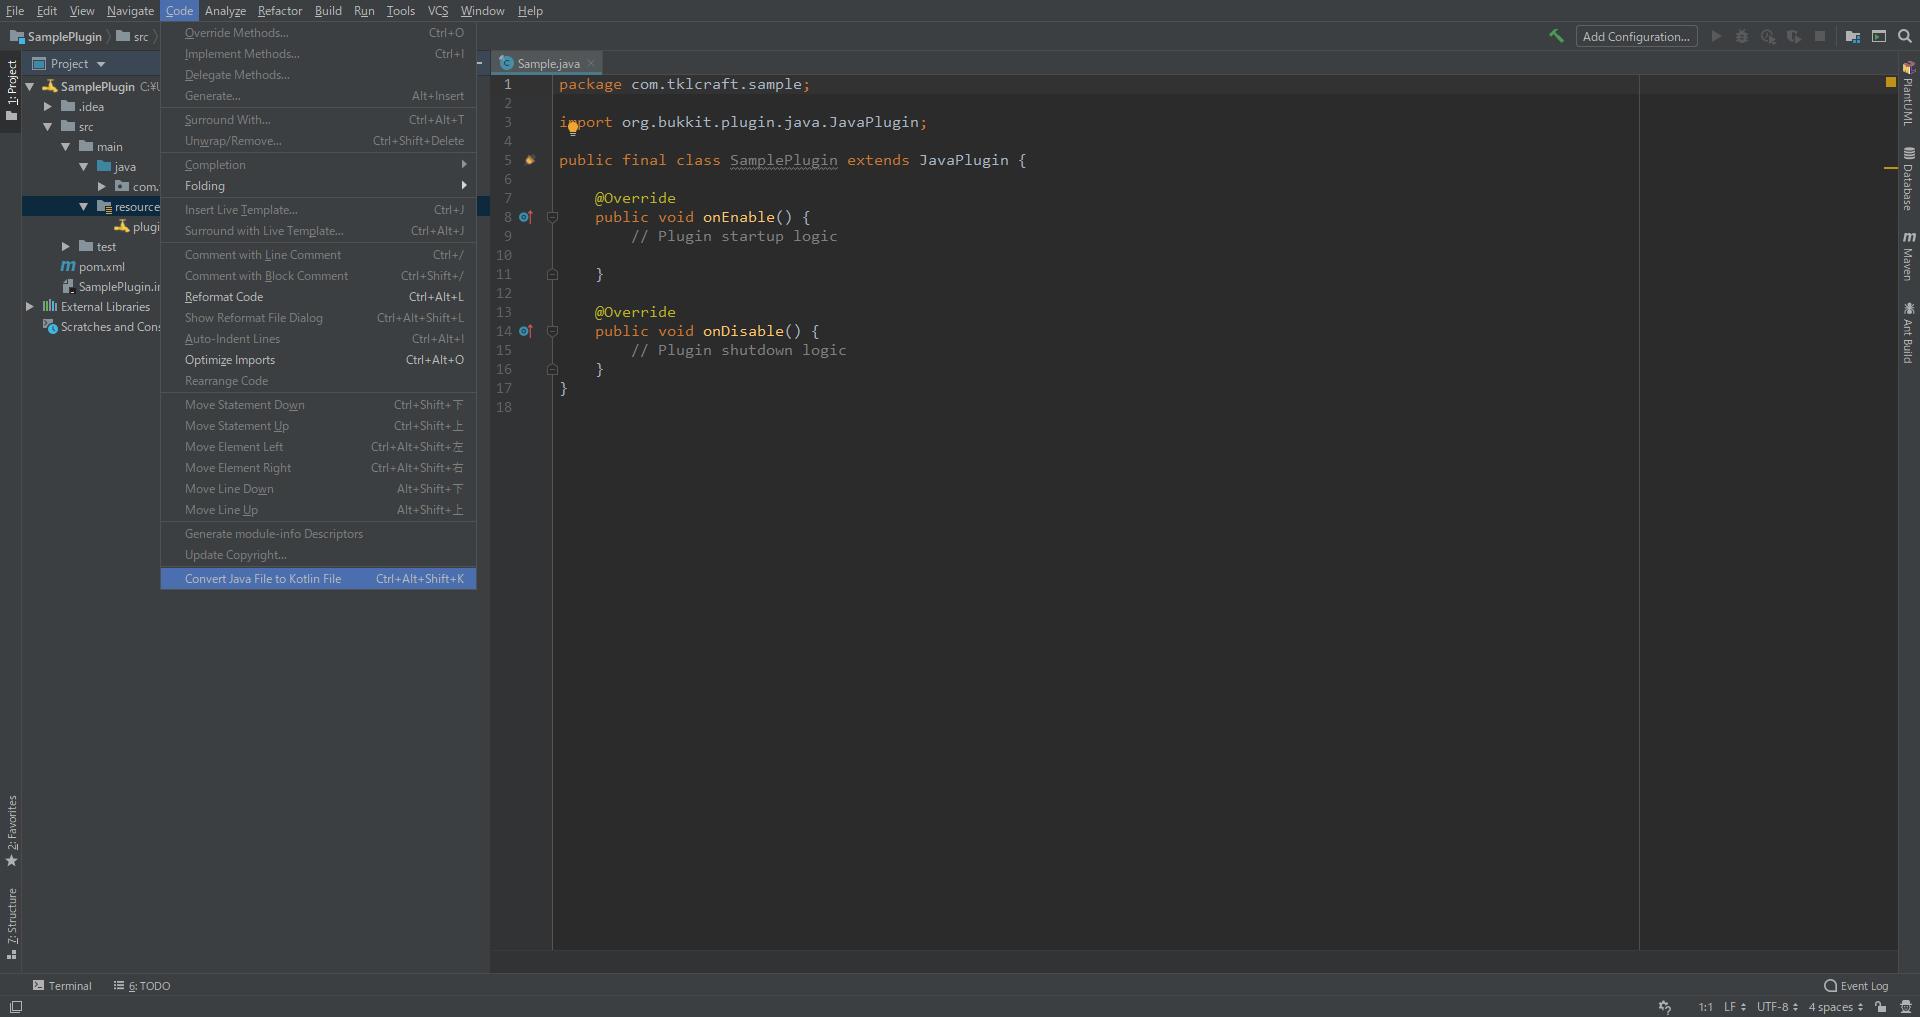 Convert Java File to Kotlin File.png